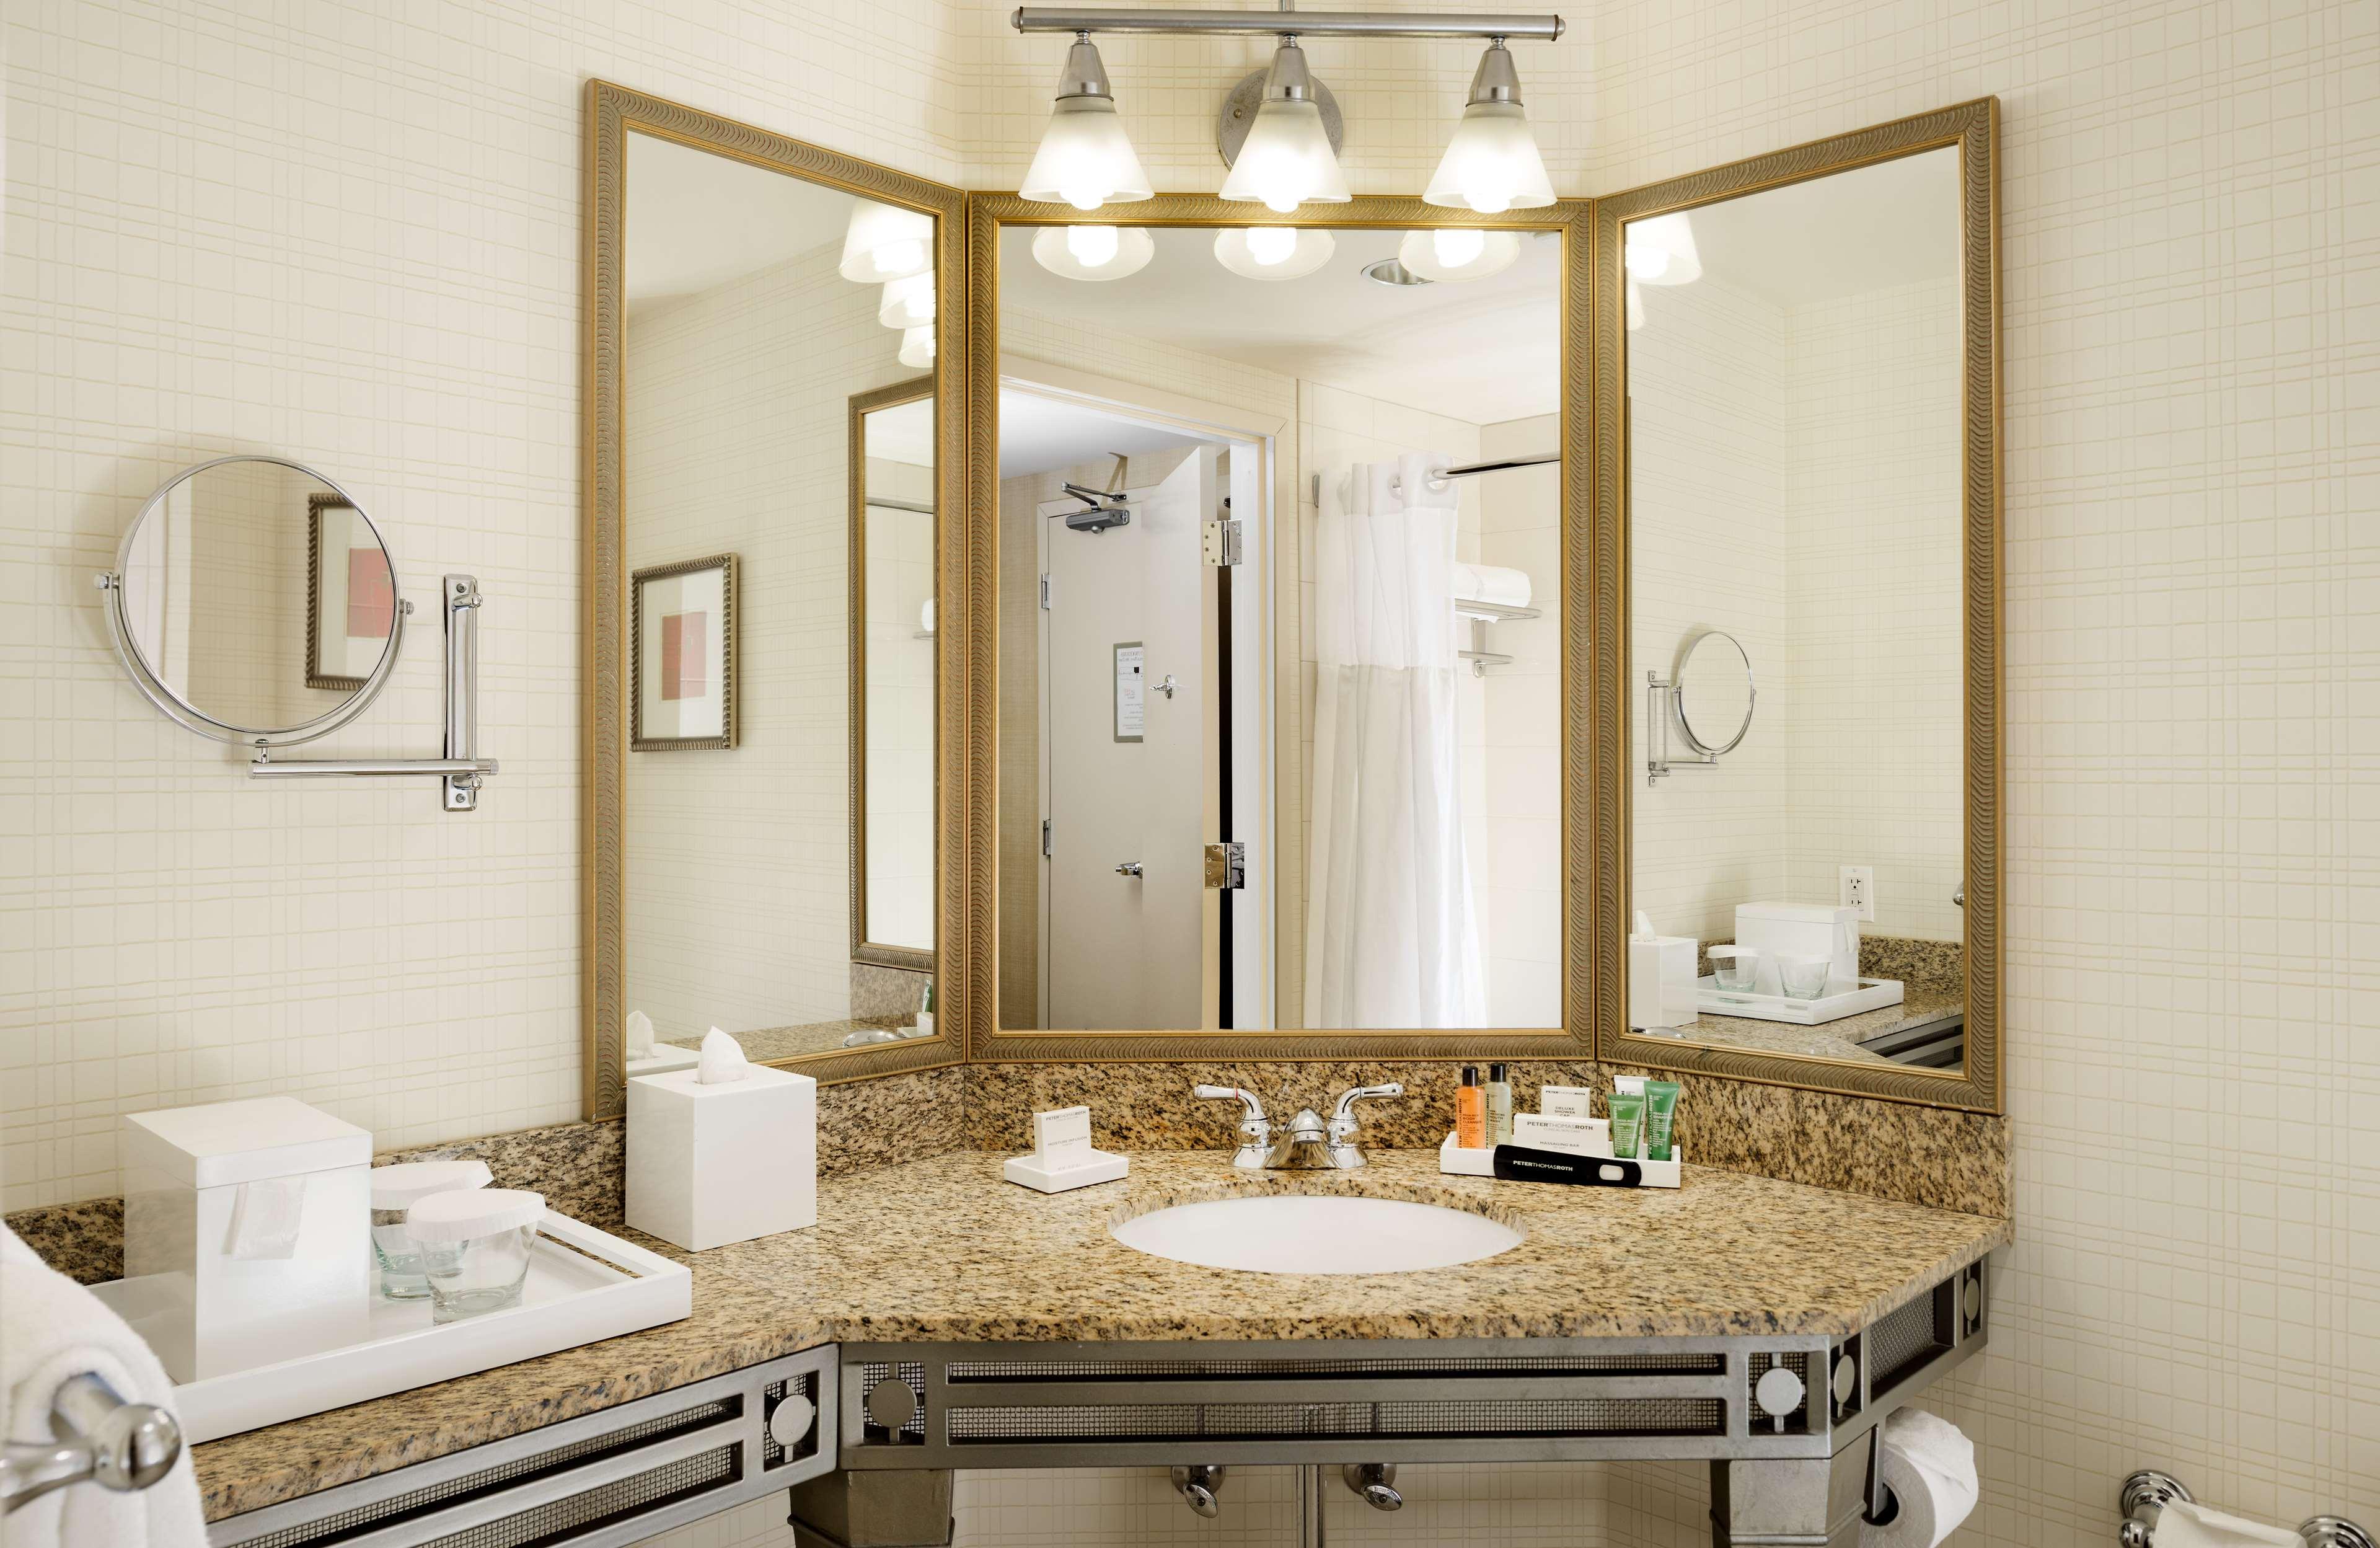 Hilton Santa Clara Room Service